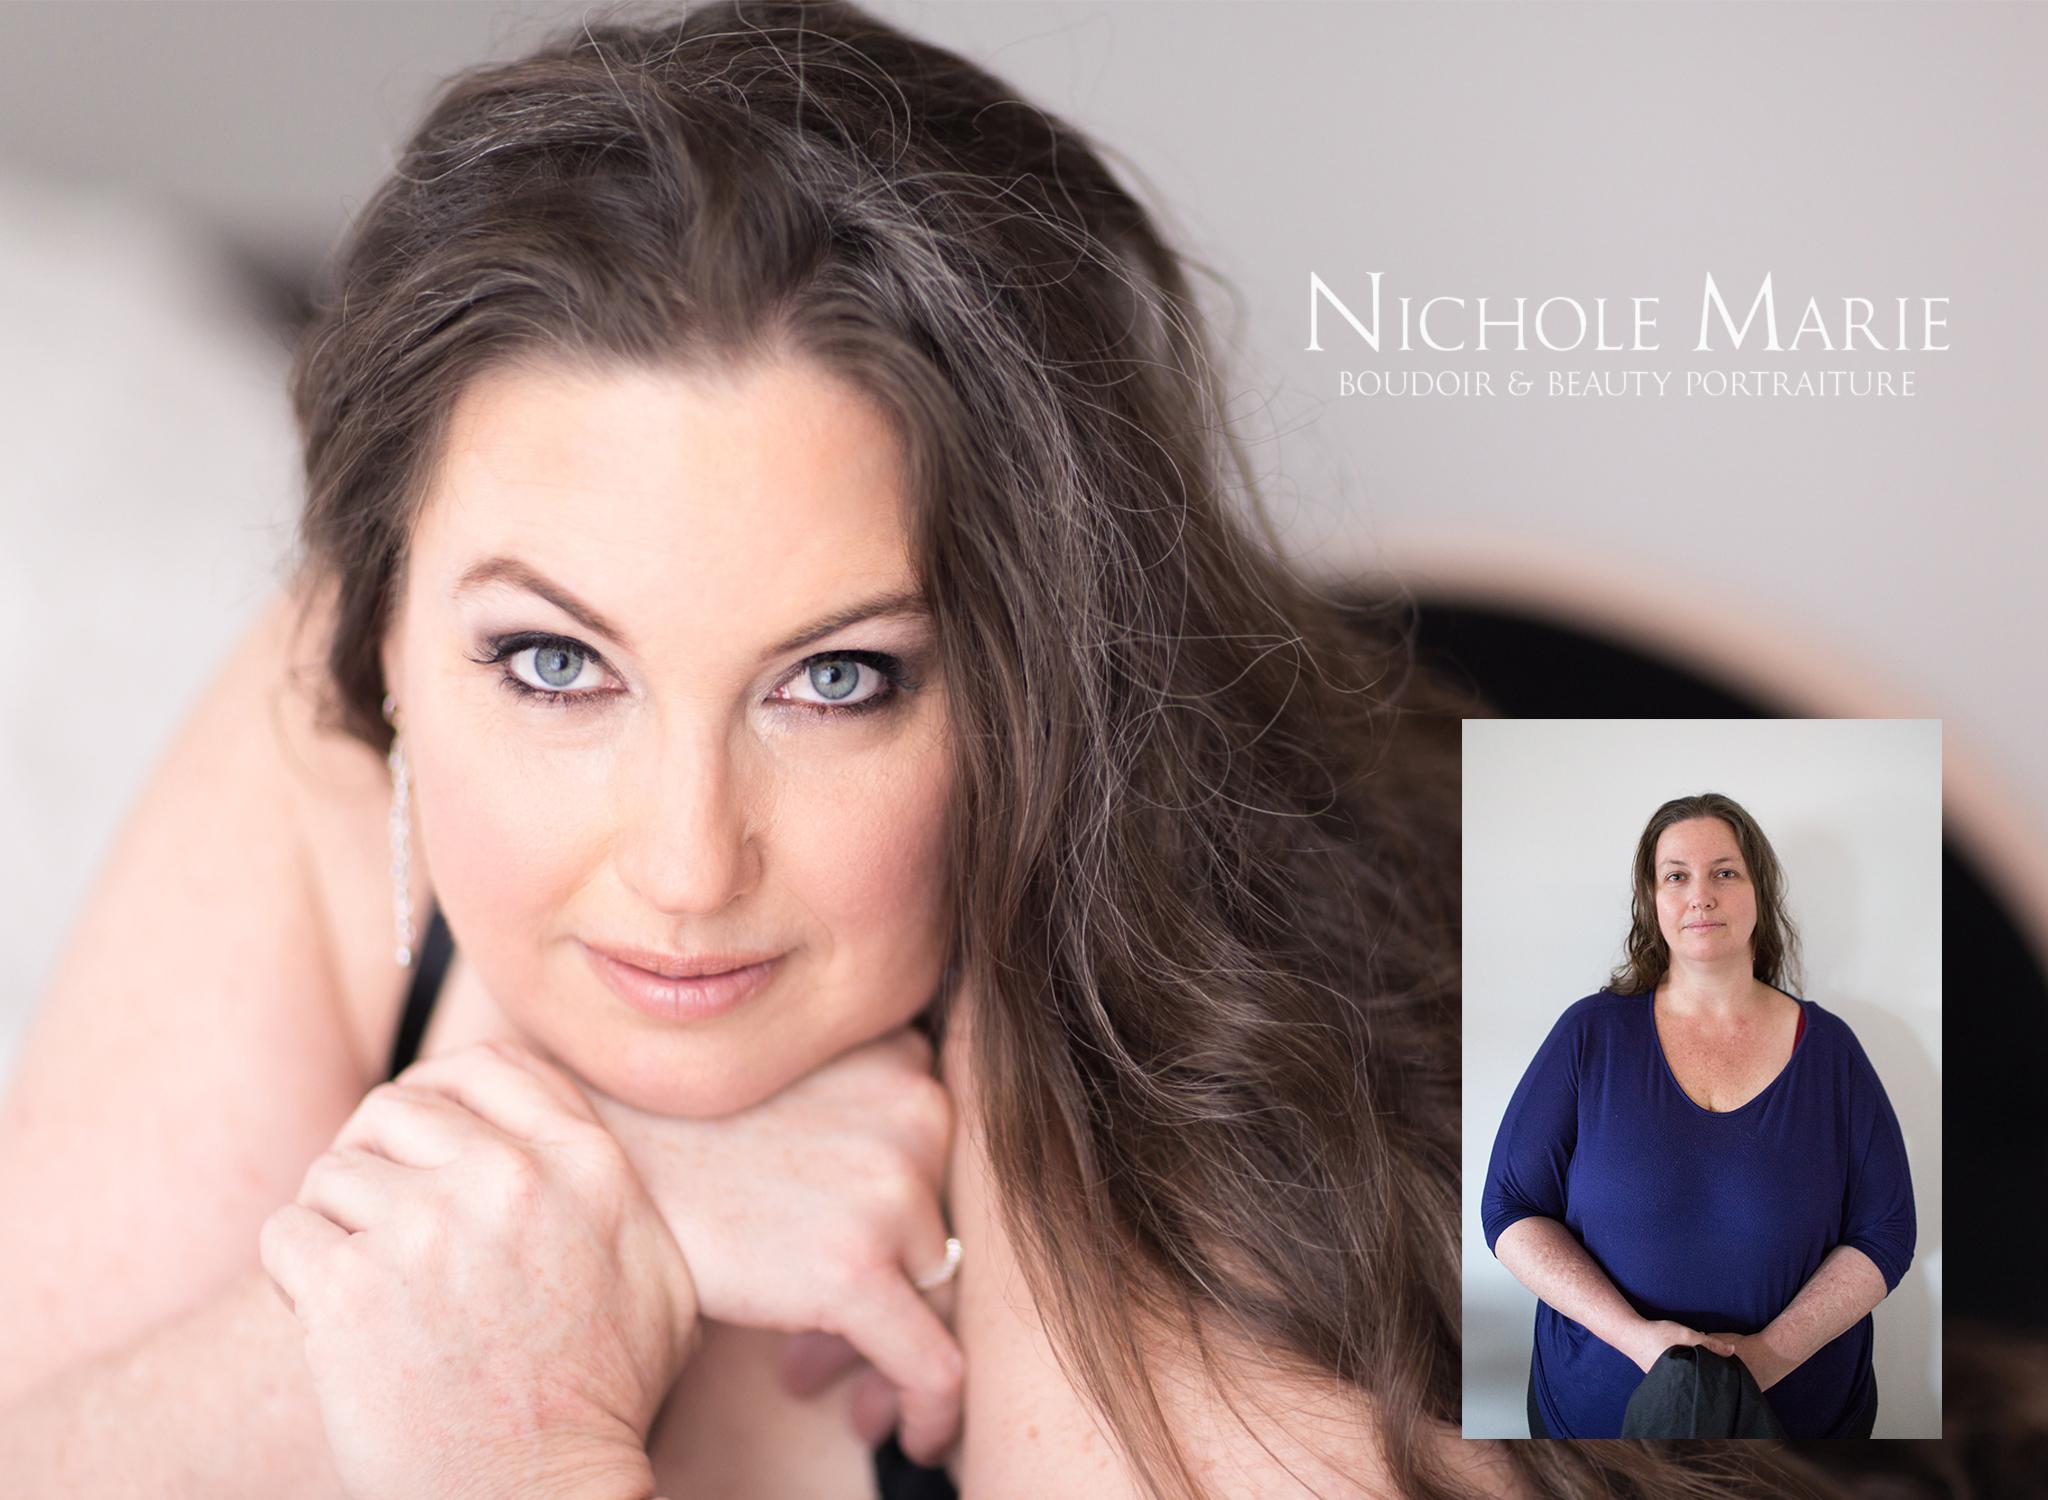 PROFESSIONAL HAIR & MAKEUP: WHY DO I NEED IT?   SEBASTIAN, FL BOUDOIR PHOTOGRAPHER  NICHOLE MARIE BOUDOIR